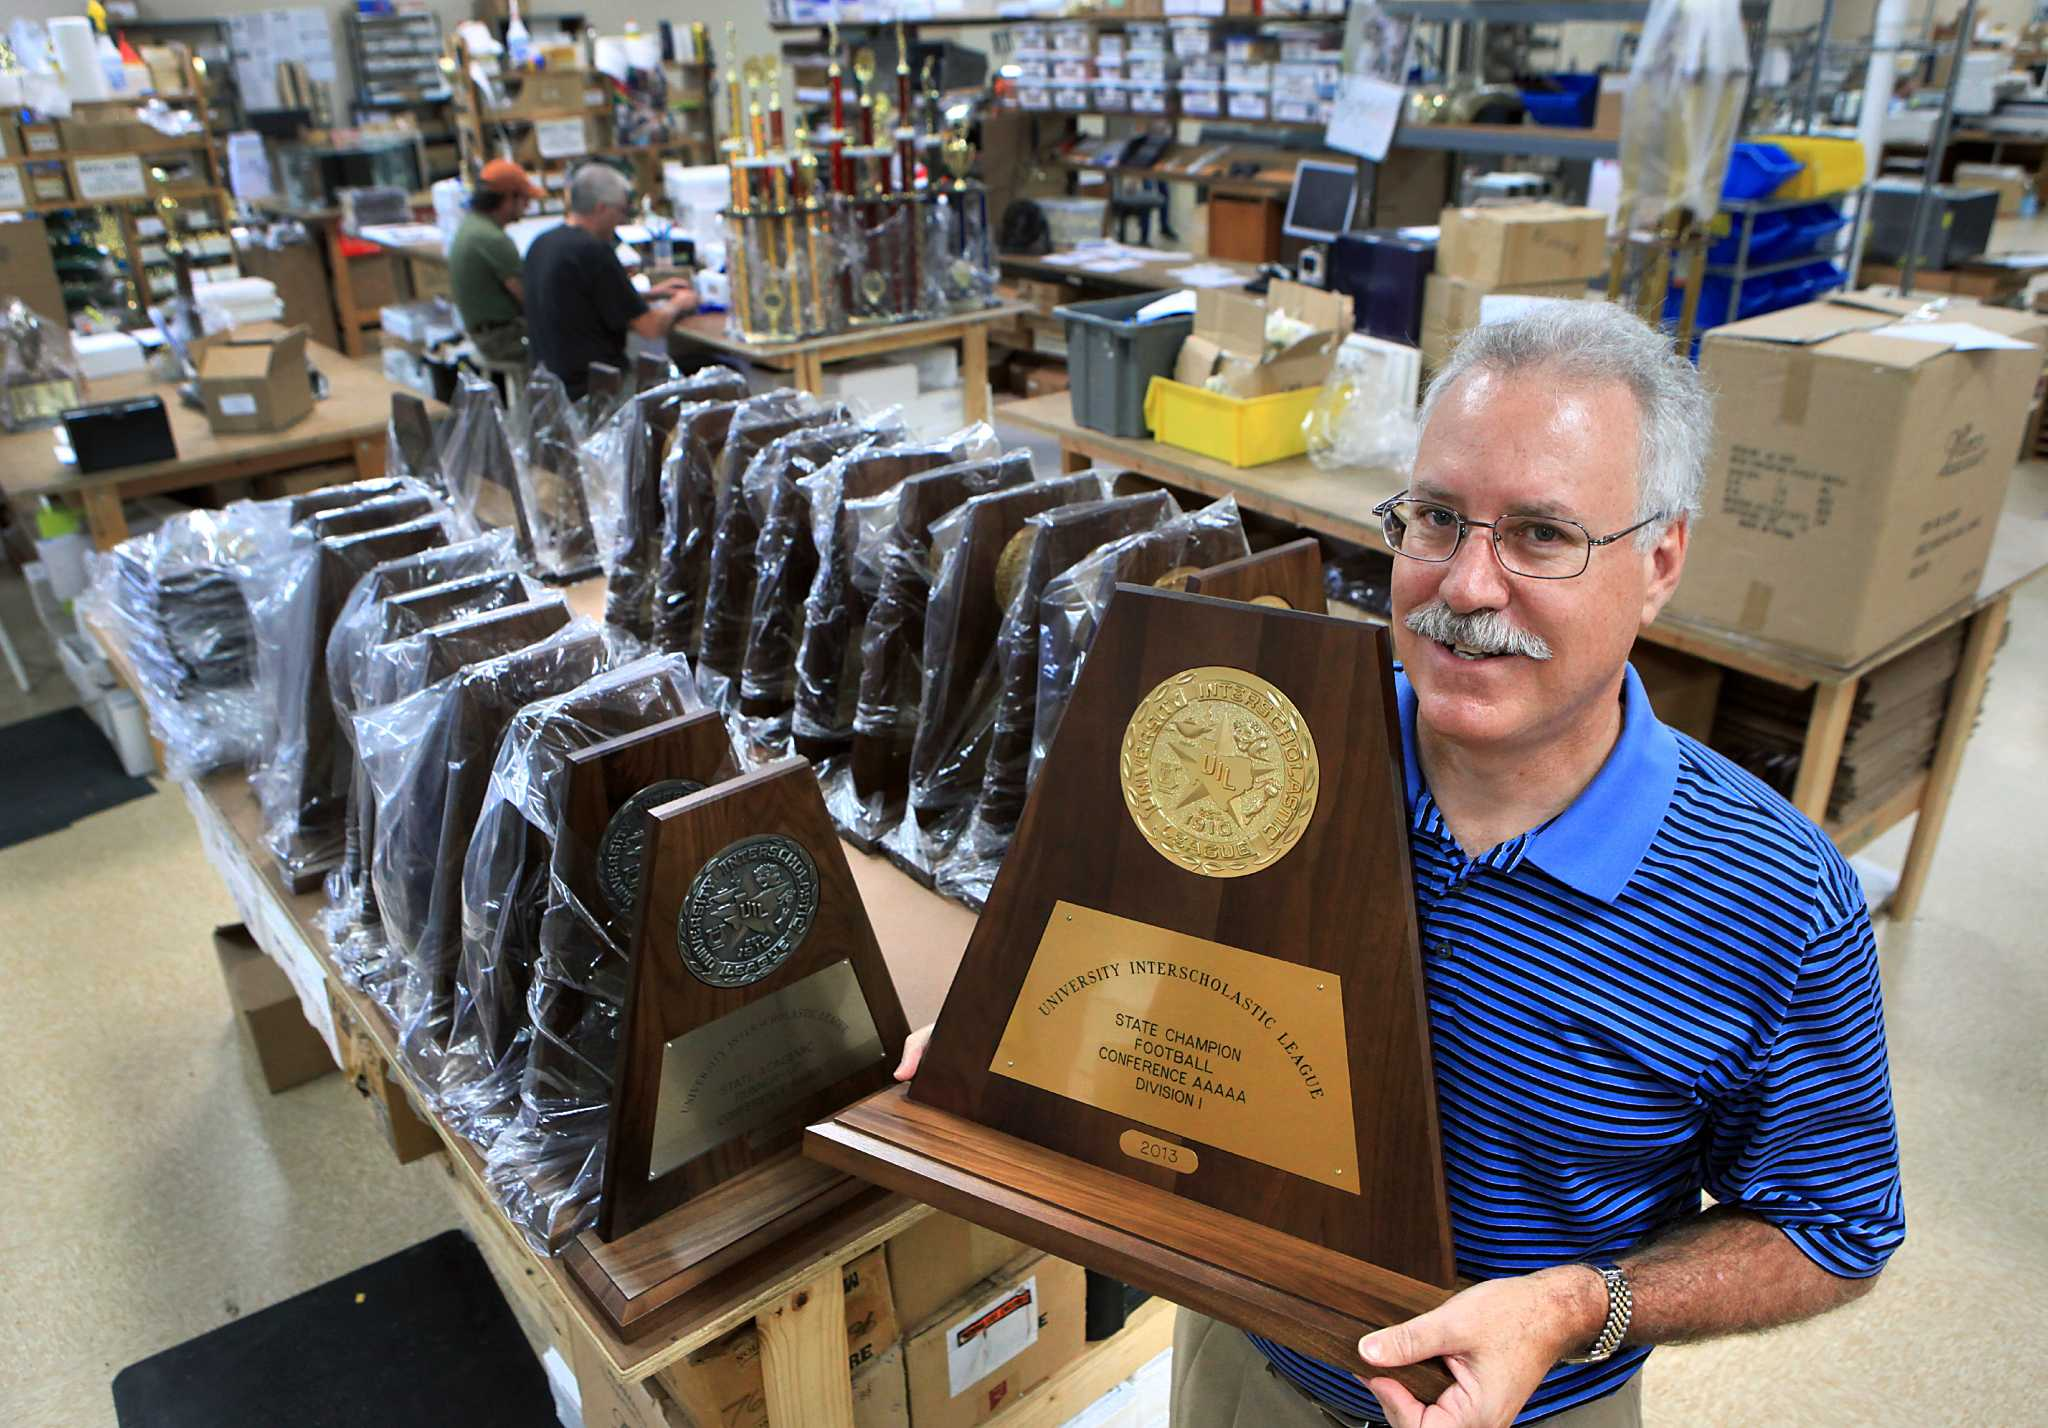 Trophy Maker Has Taken Winning Path Toward Top San